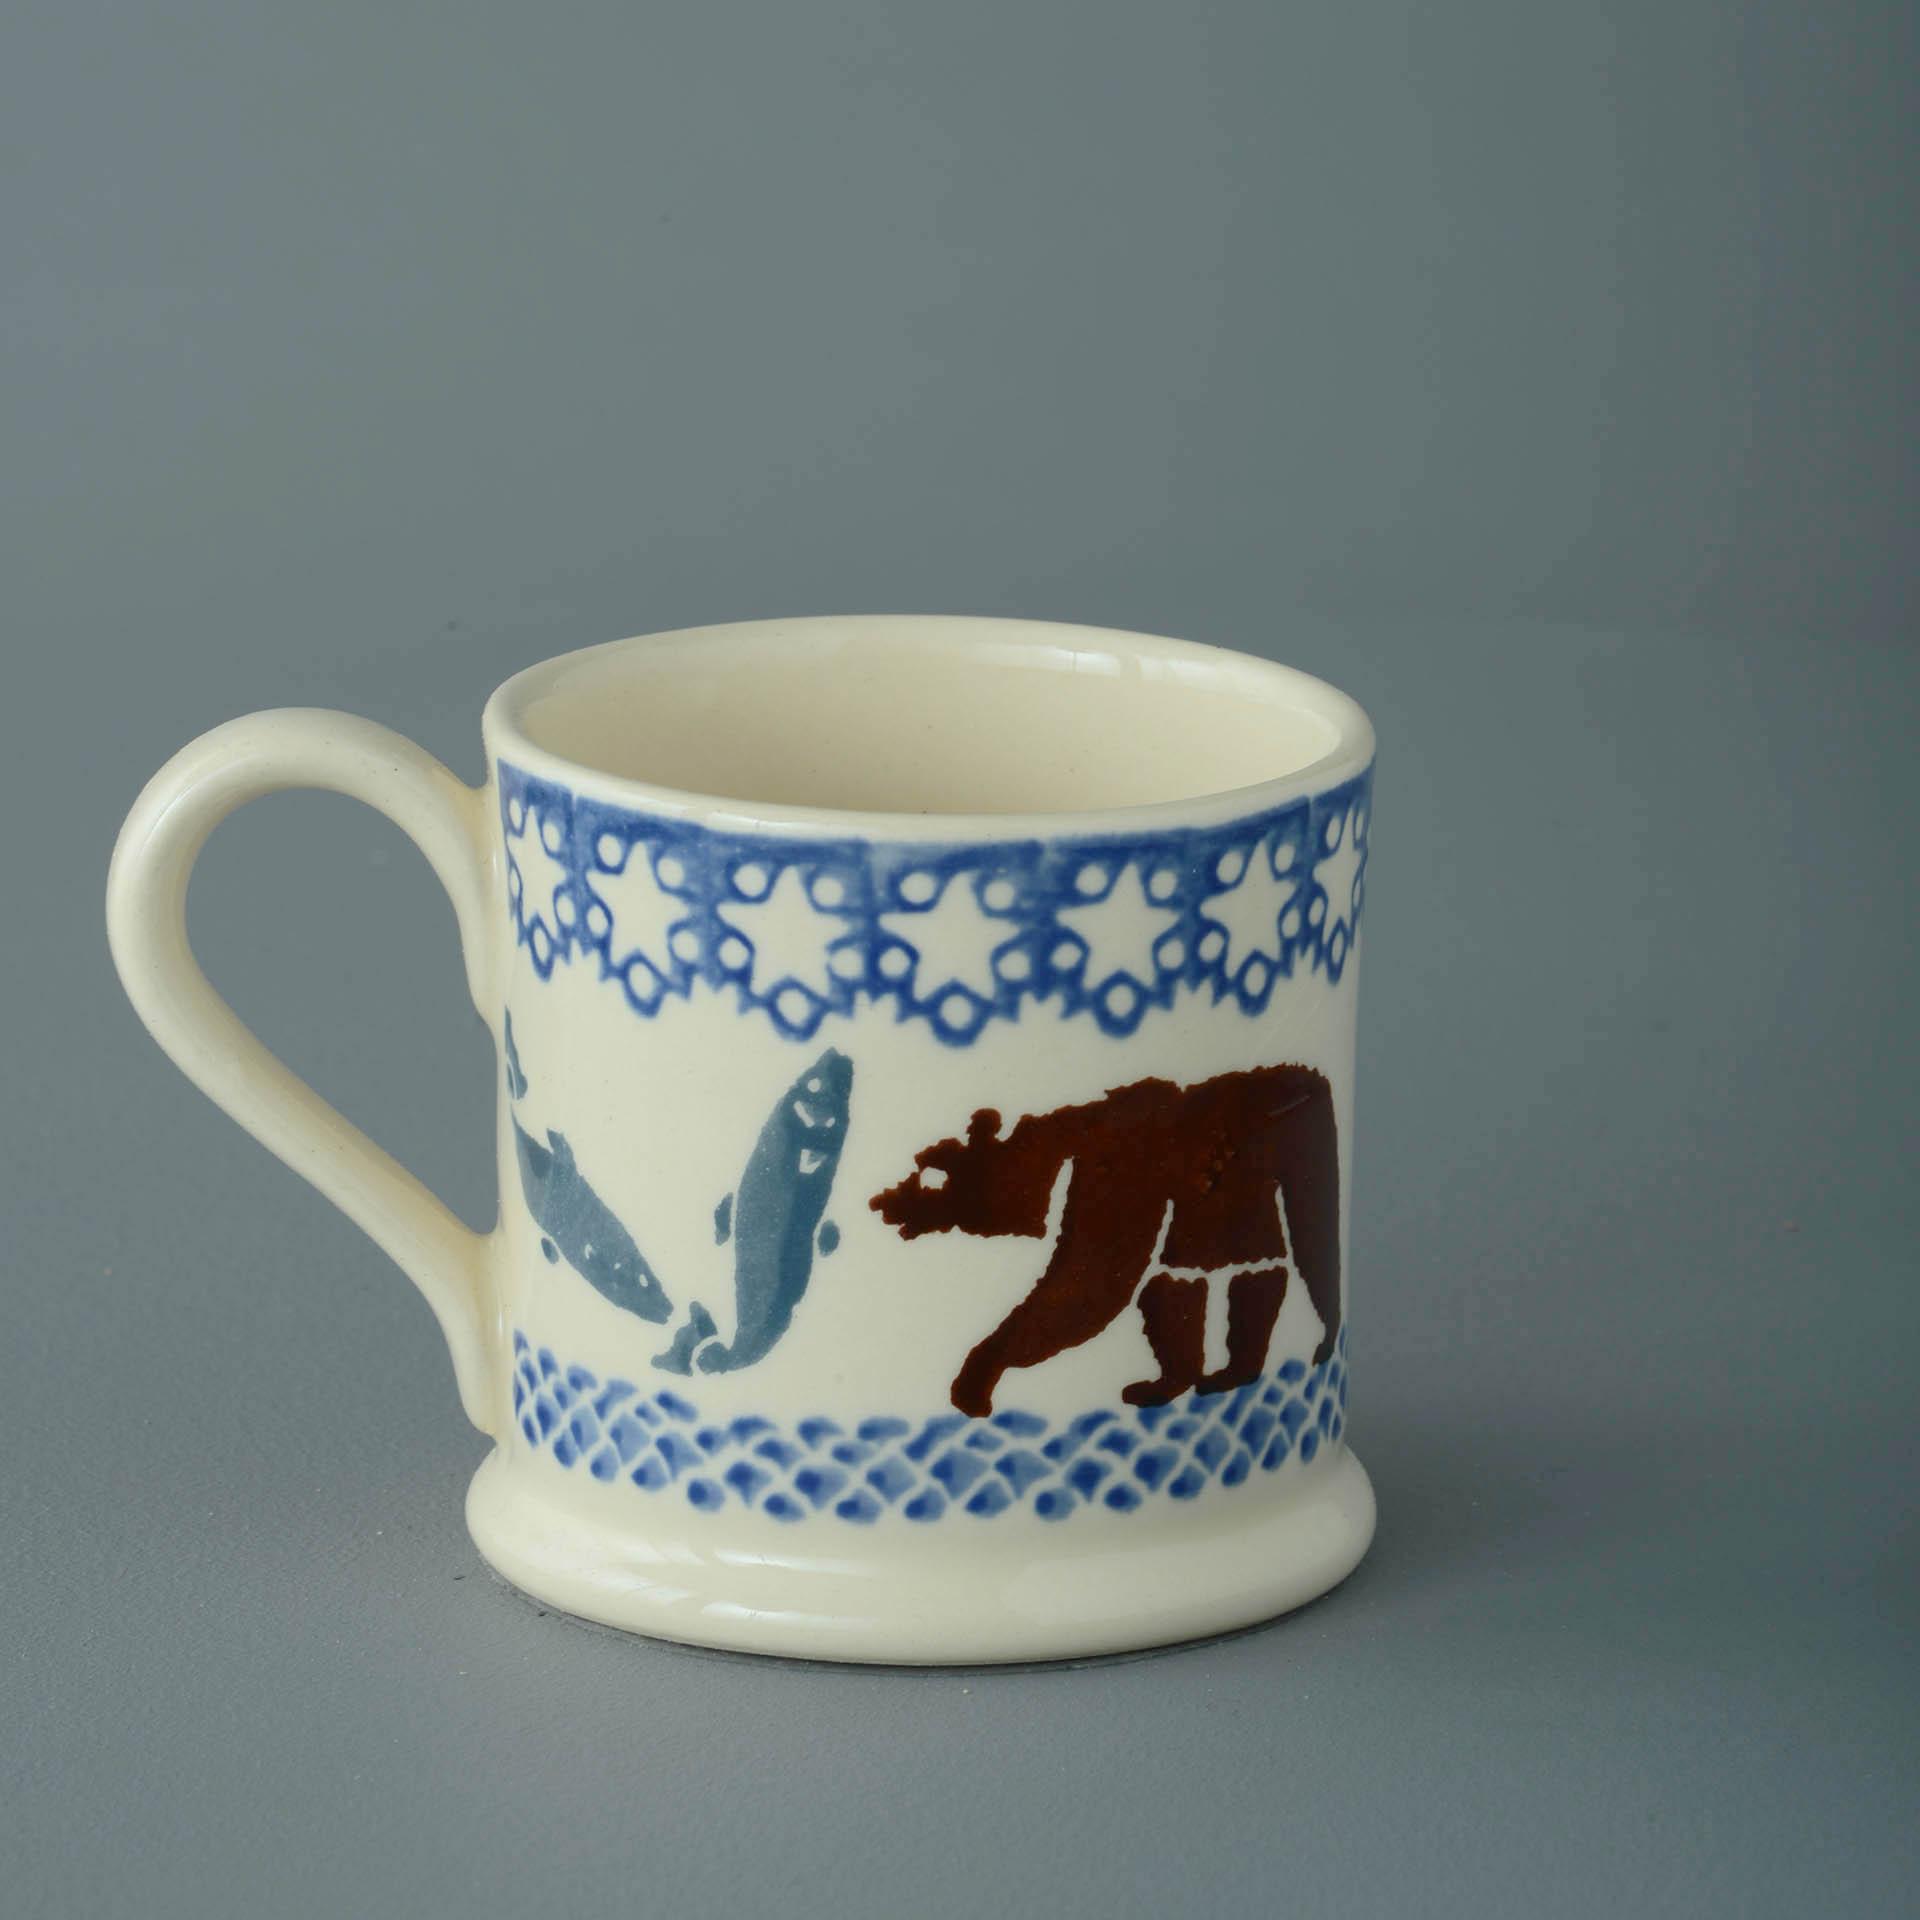 Bear and Fish 150ml Small Mug 7 x 7.3cm